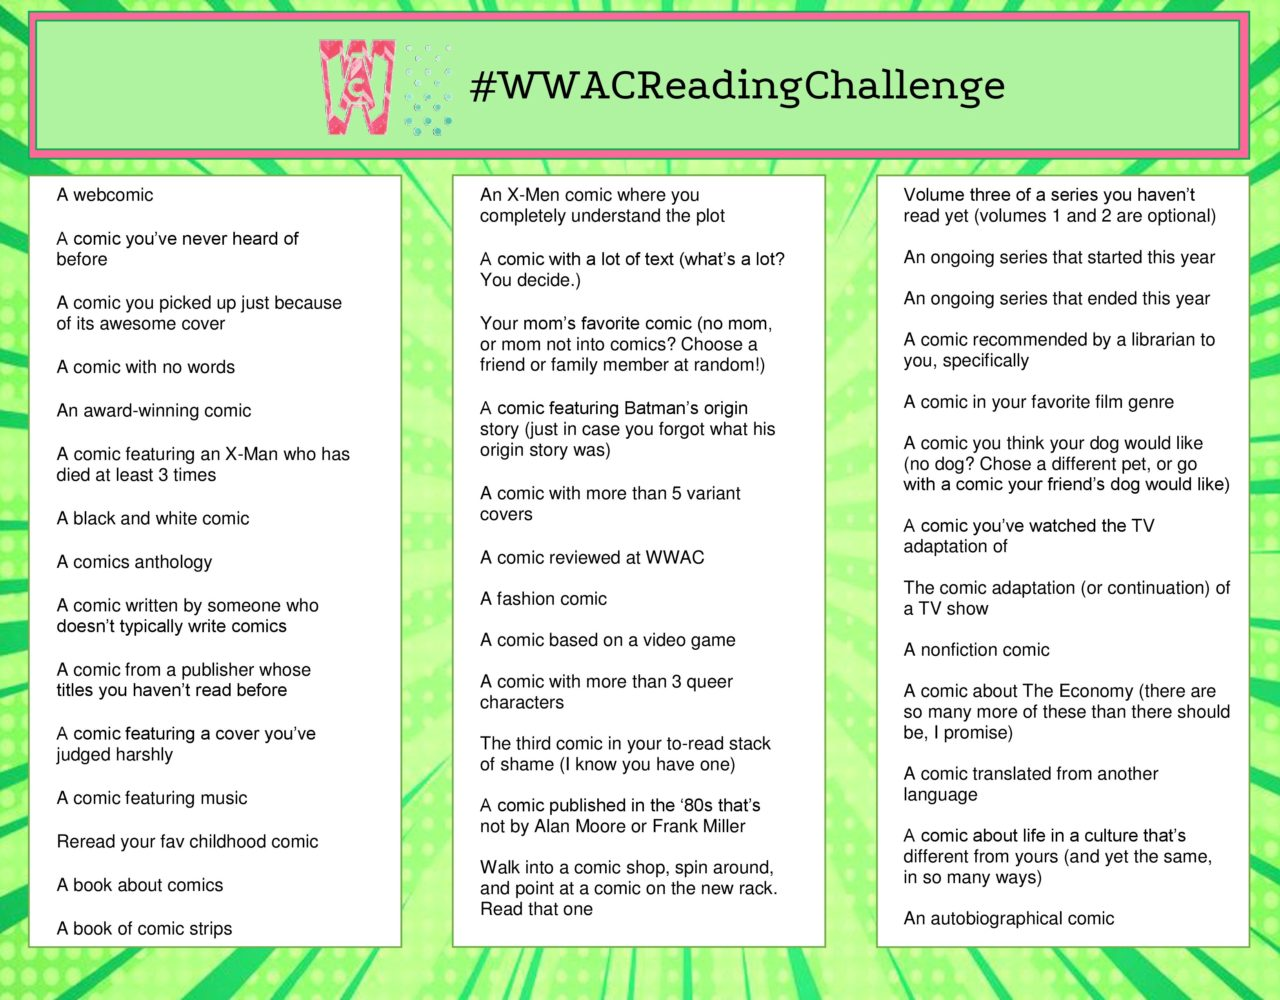 WWAC Reading Challenge (designed by Paige Allen)